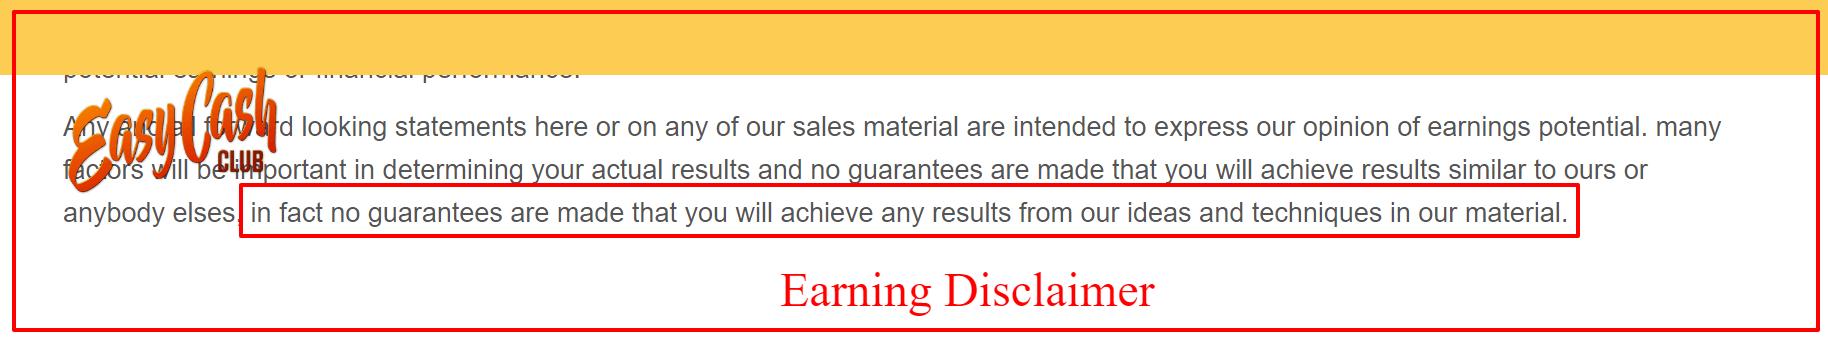 Earnings Disclaimer >> Earnings Disclaimer Top Car Release 2020